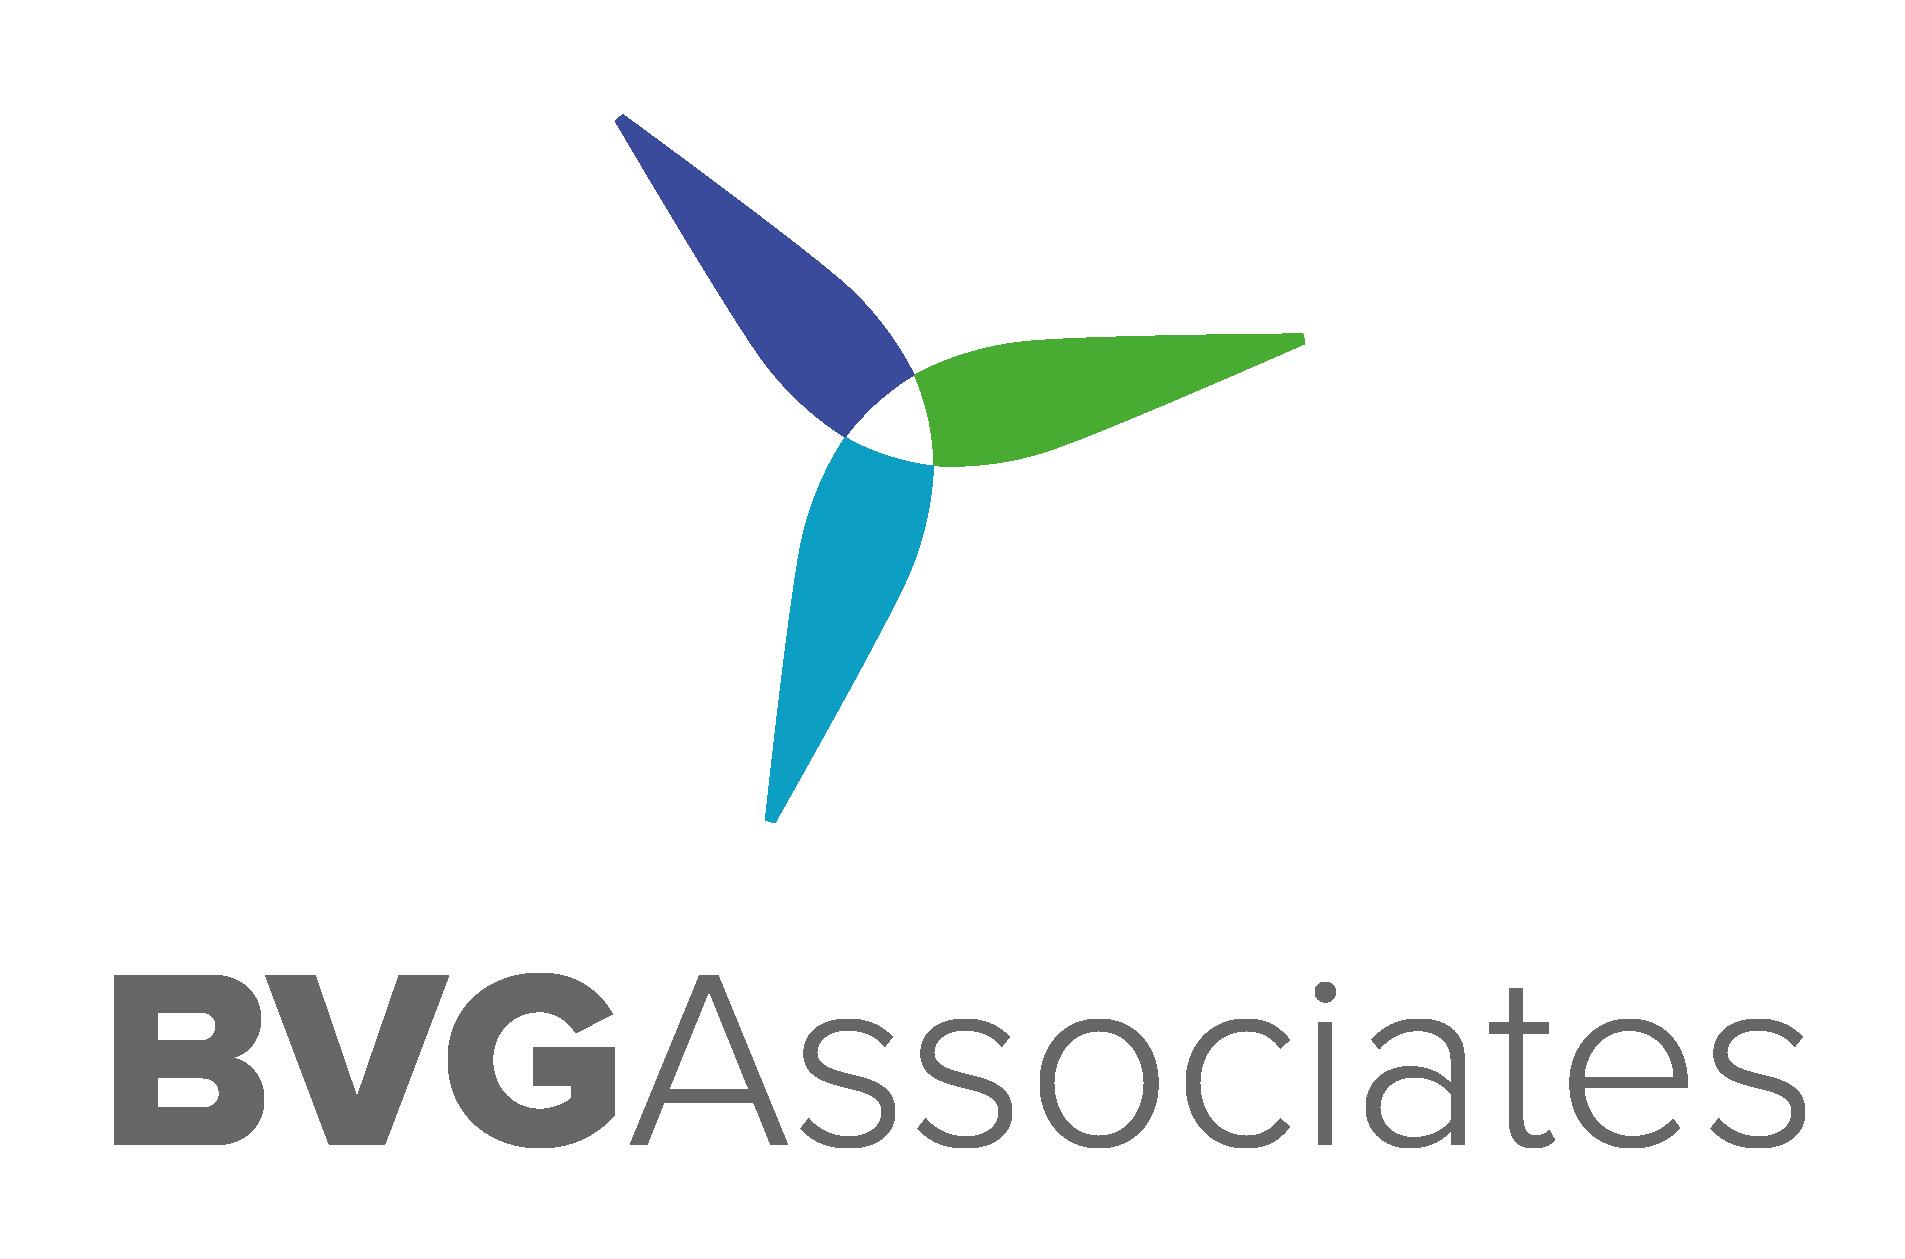 bvg associates